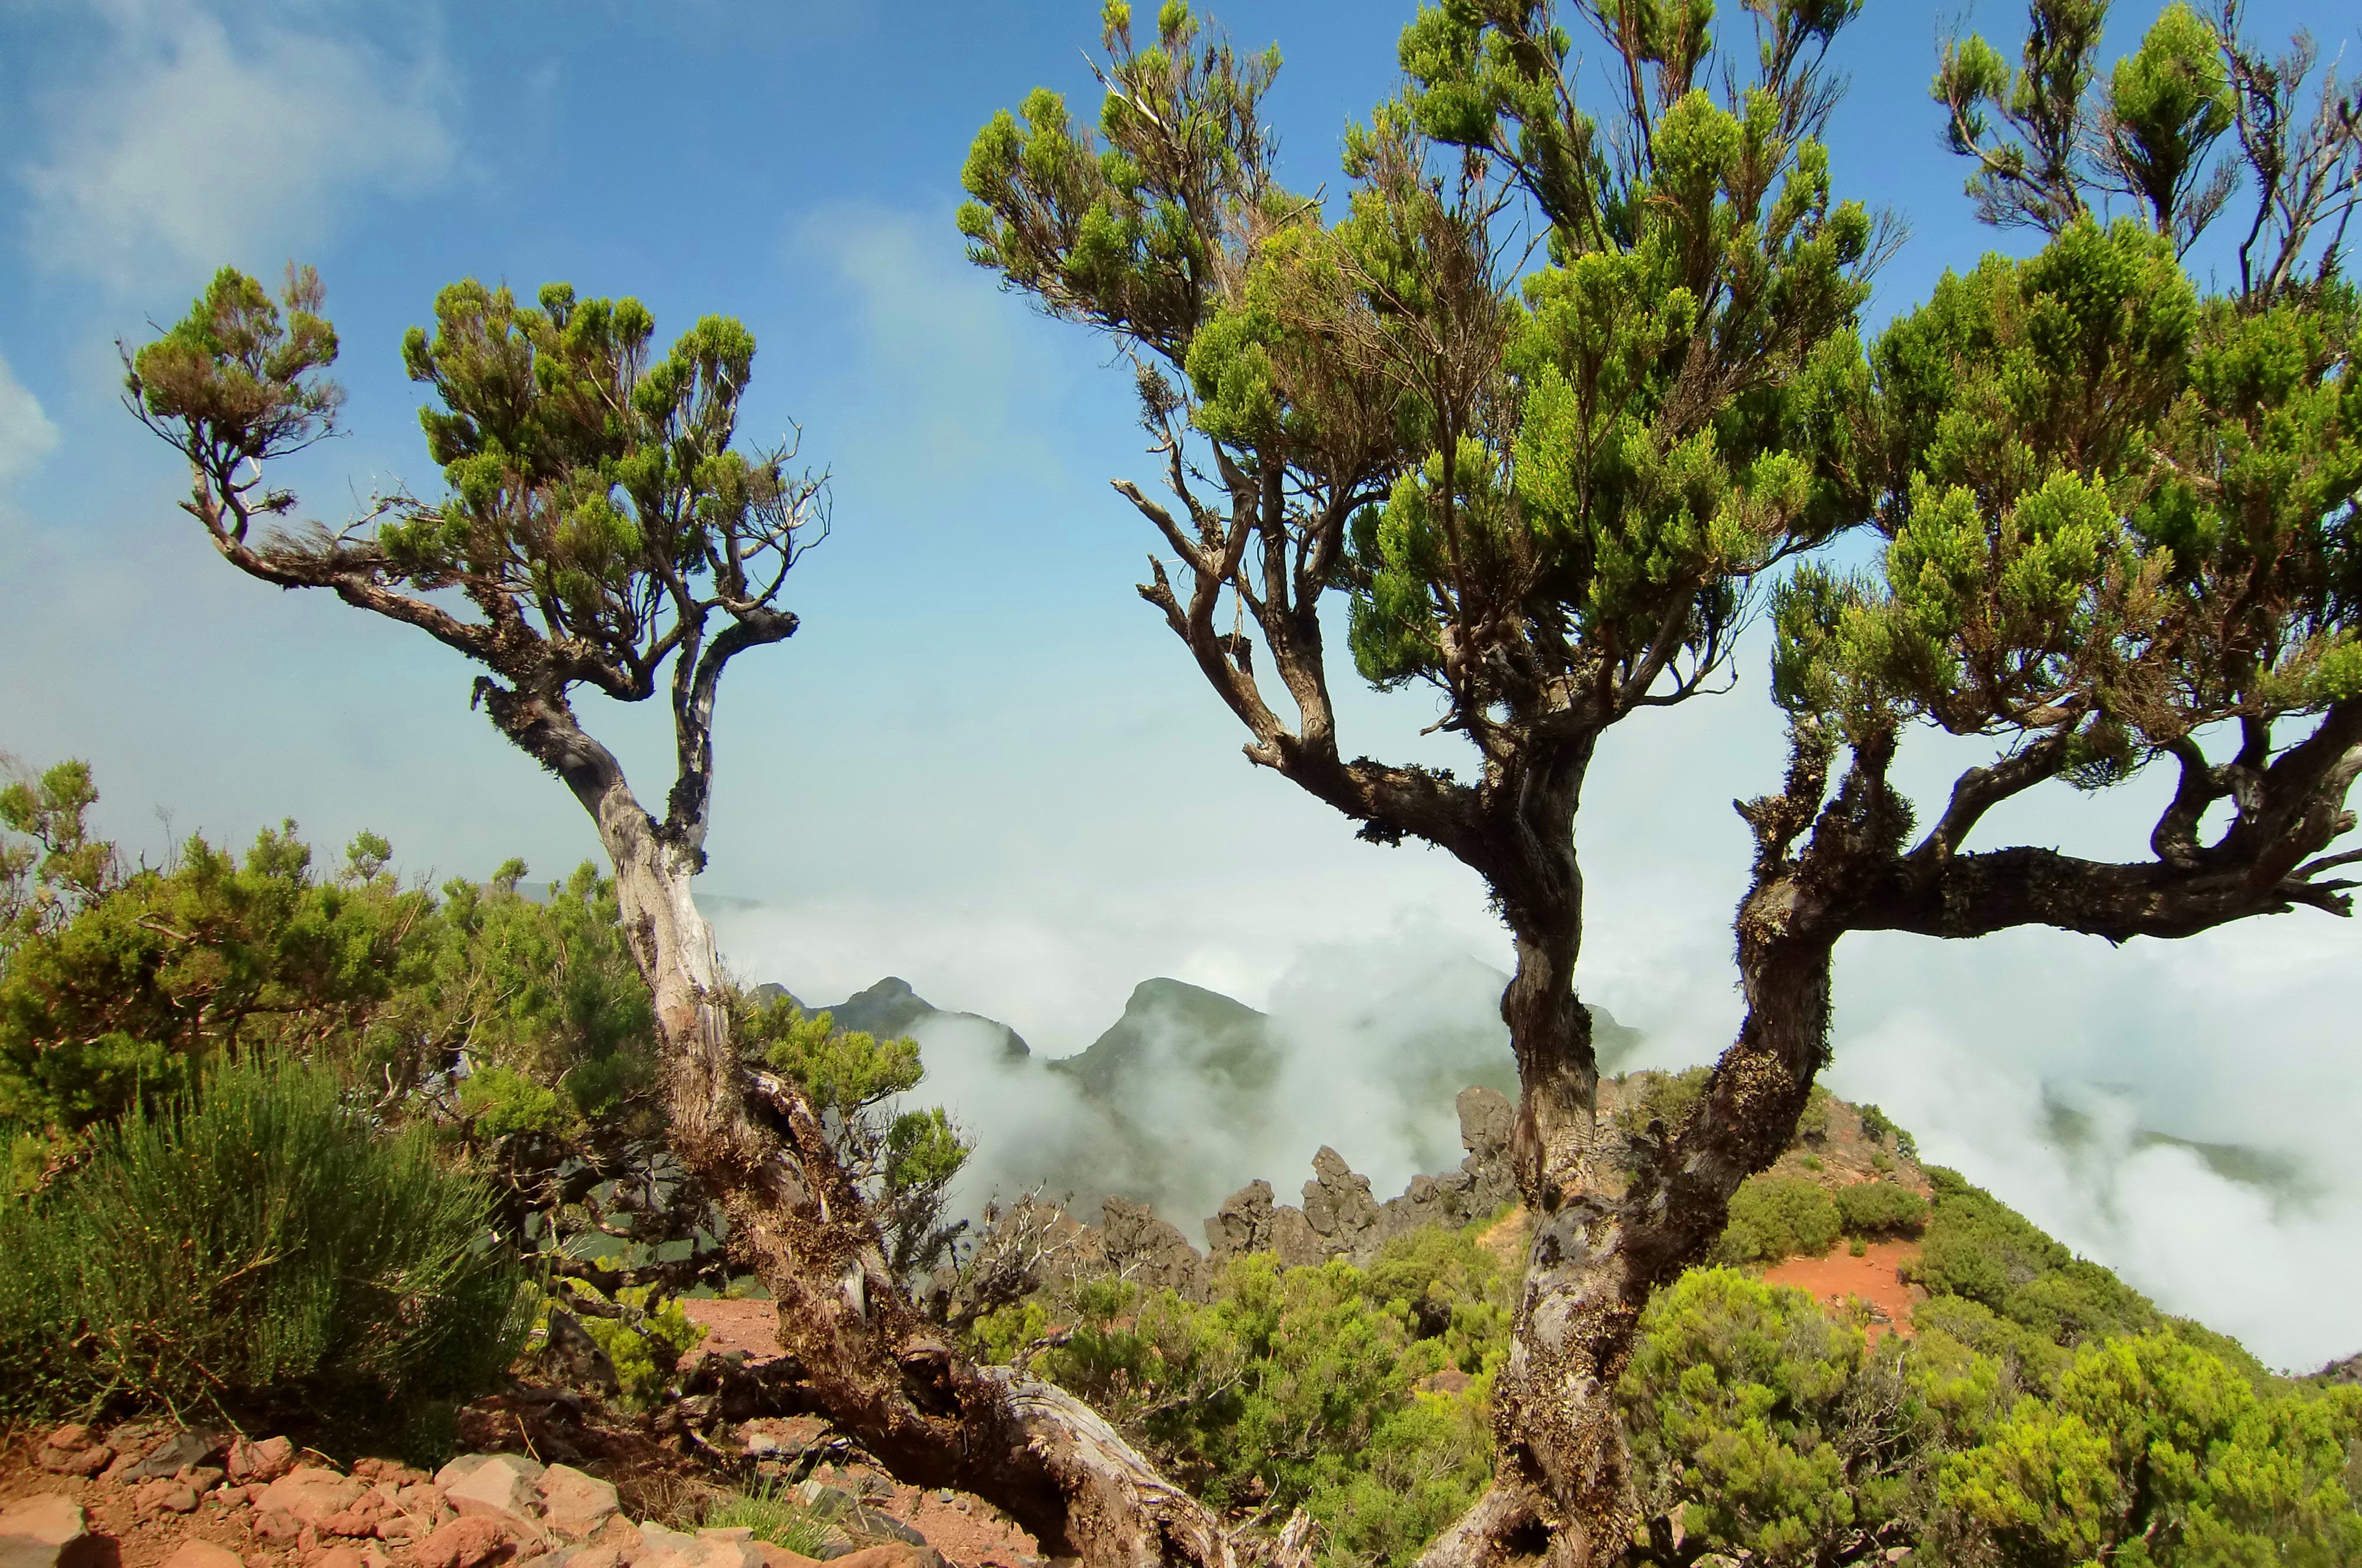 Madeira landscape